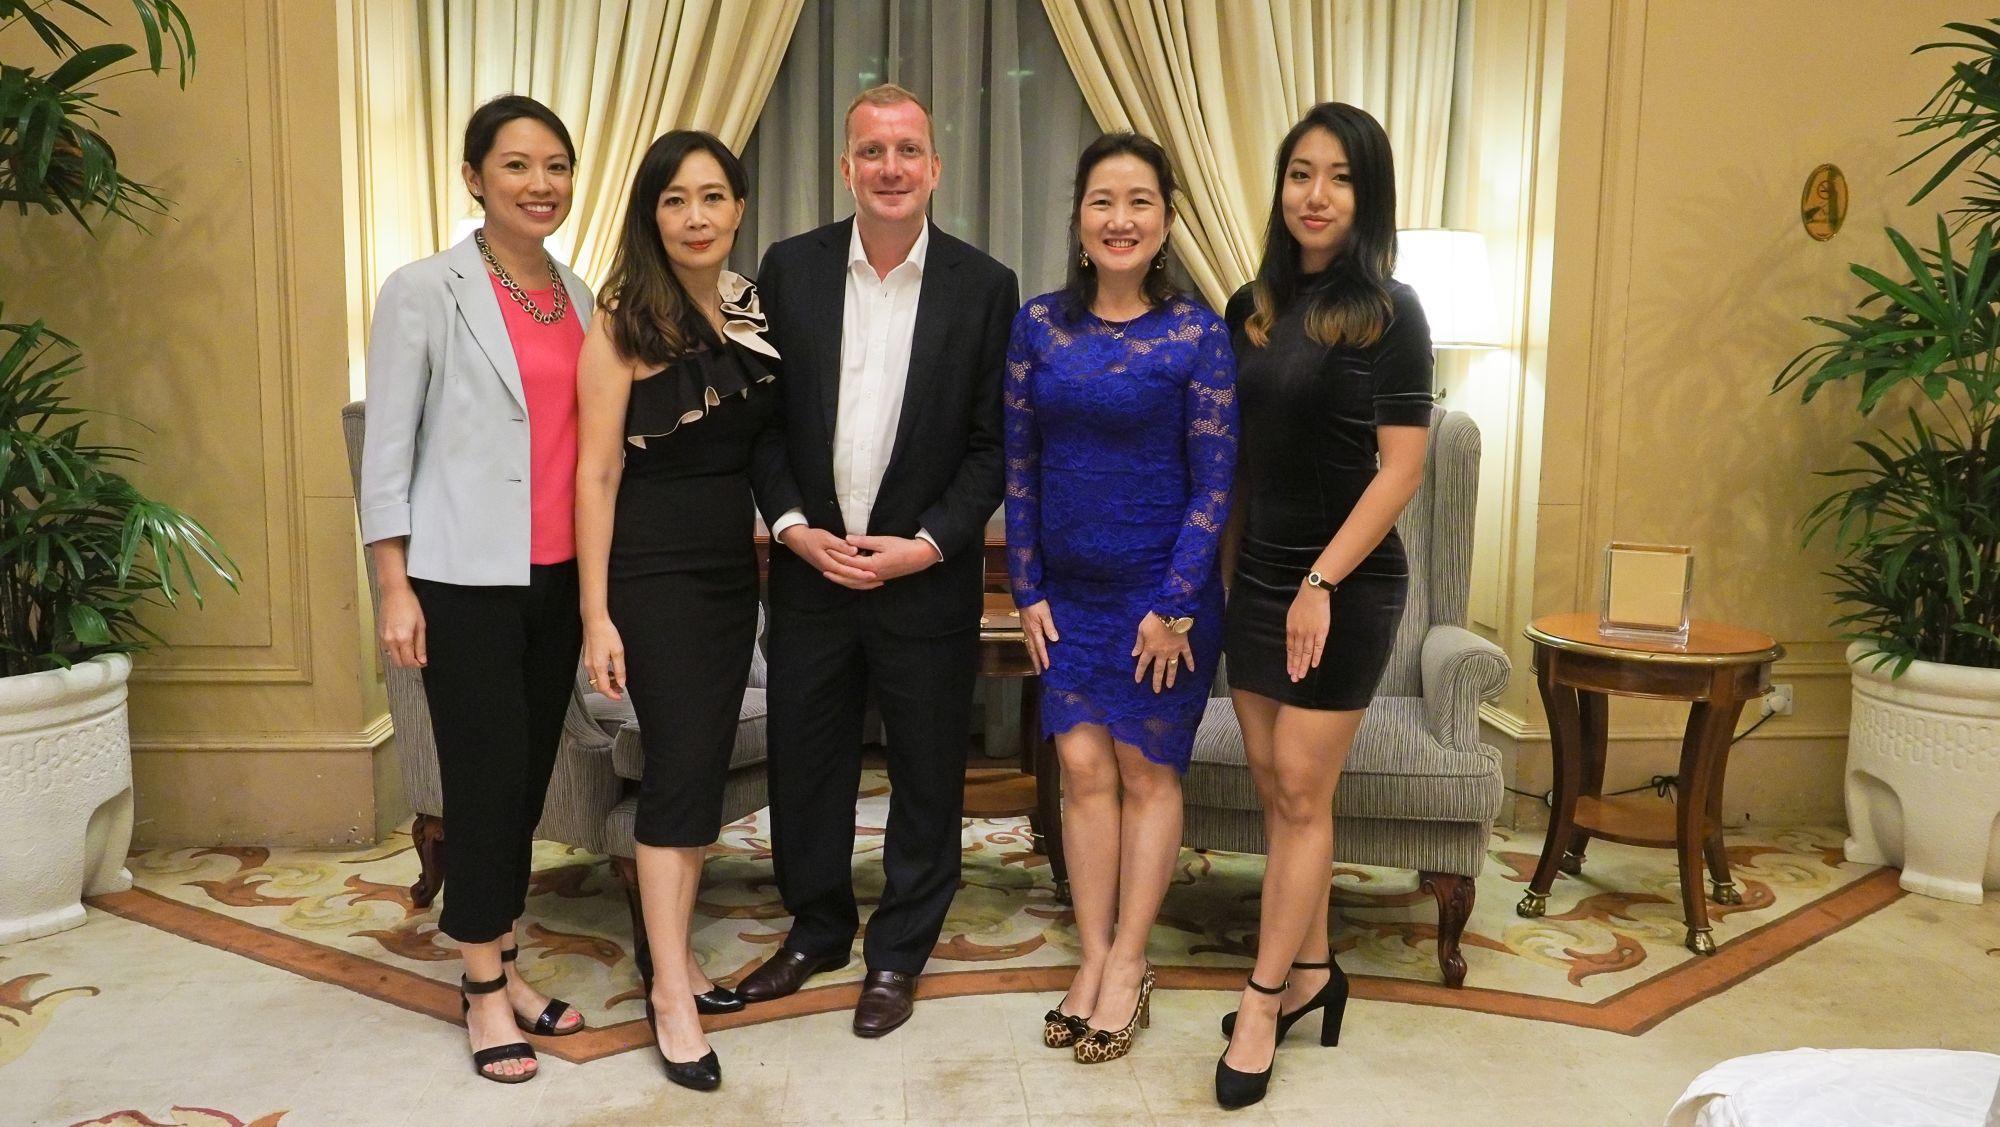 Lina Schindler, Irene SM Lee, Matthew Kasdin, Dawn Tam, Tammy Ho